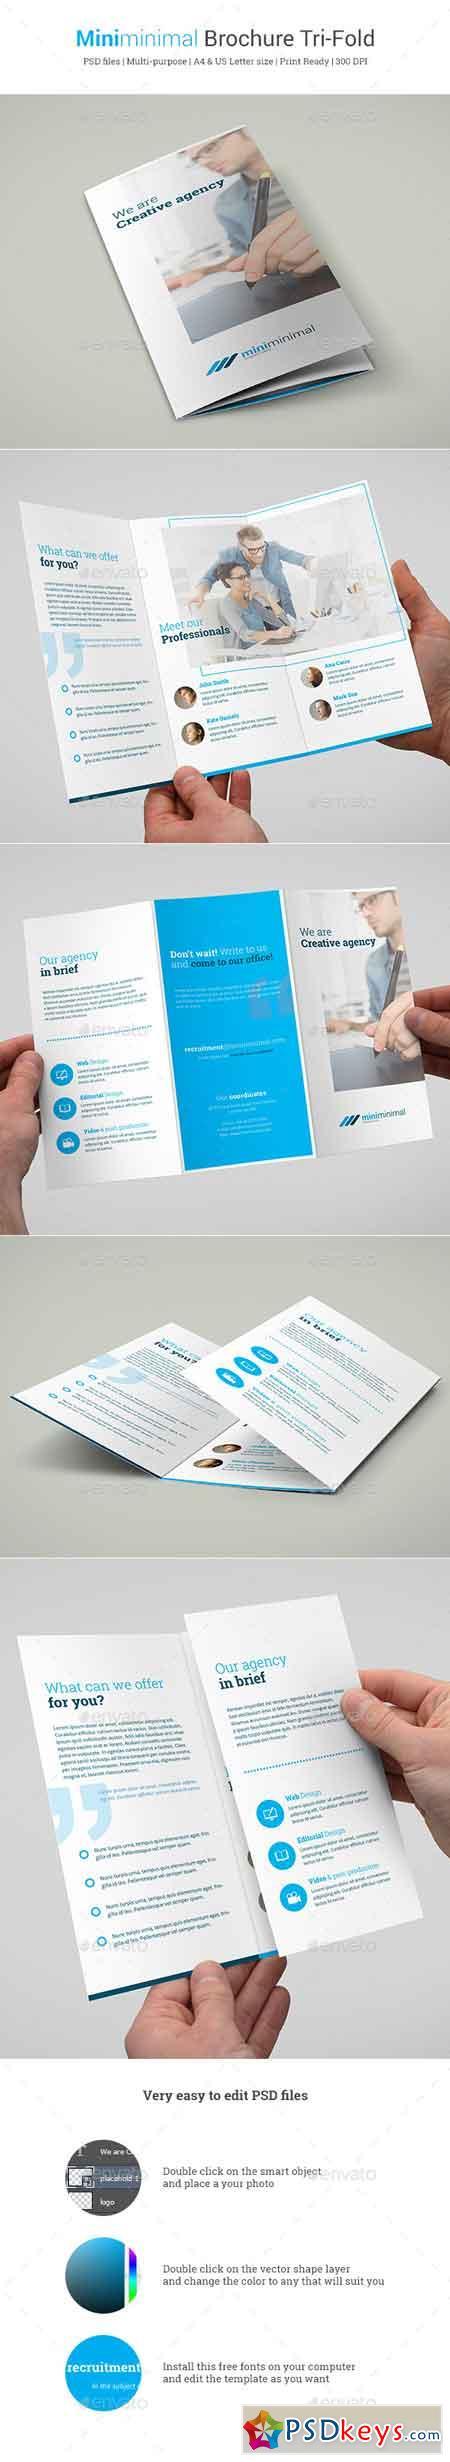 Miniminimal Brochure Tri-Fold 10472350